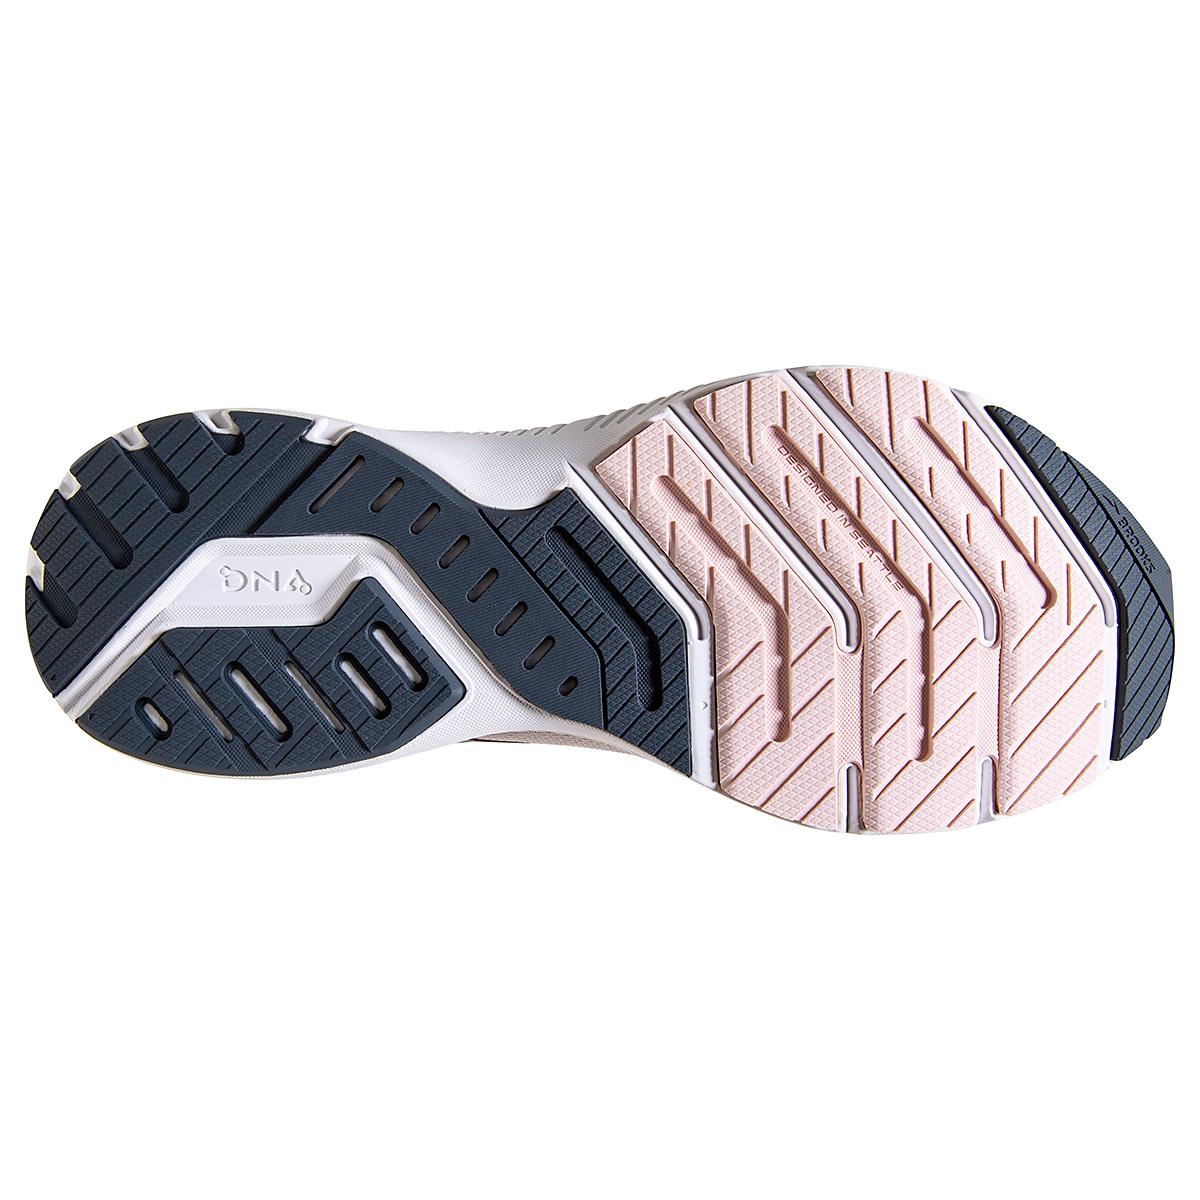 Women's Brooks Launch 8 Running Shoe - Color: Primrose/Ombre/Metallic - Size: 5 - Width: Regular, Primrose/Ombre/Metallic, large, image 6